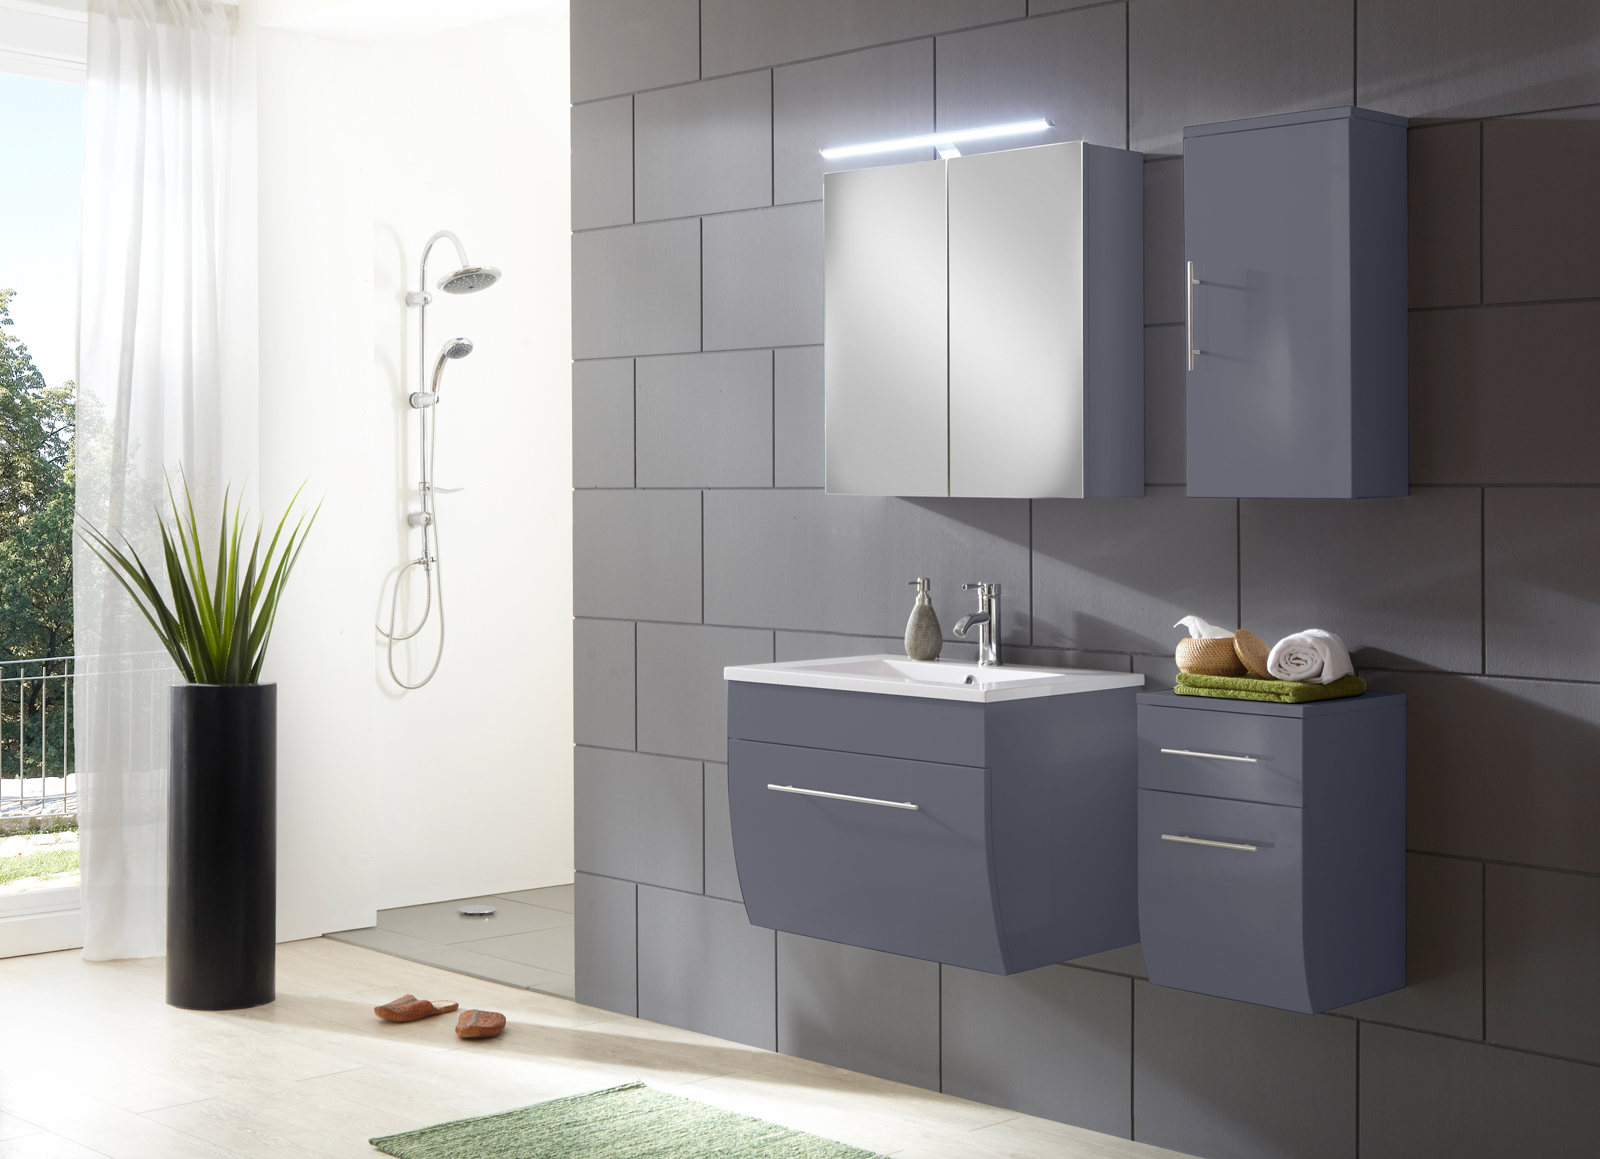 sam badezimmerm bel zagona 4tlg grau hochglanz 70 cm auf lager. Black Bedroom Furniture Sets. Home Design Ideas